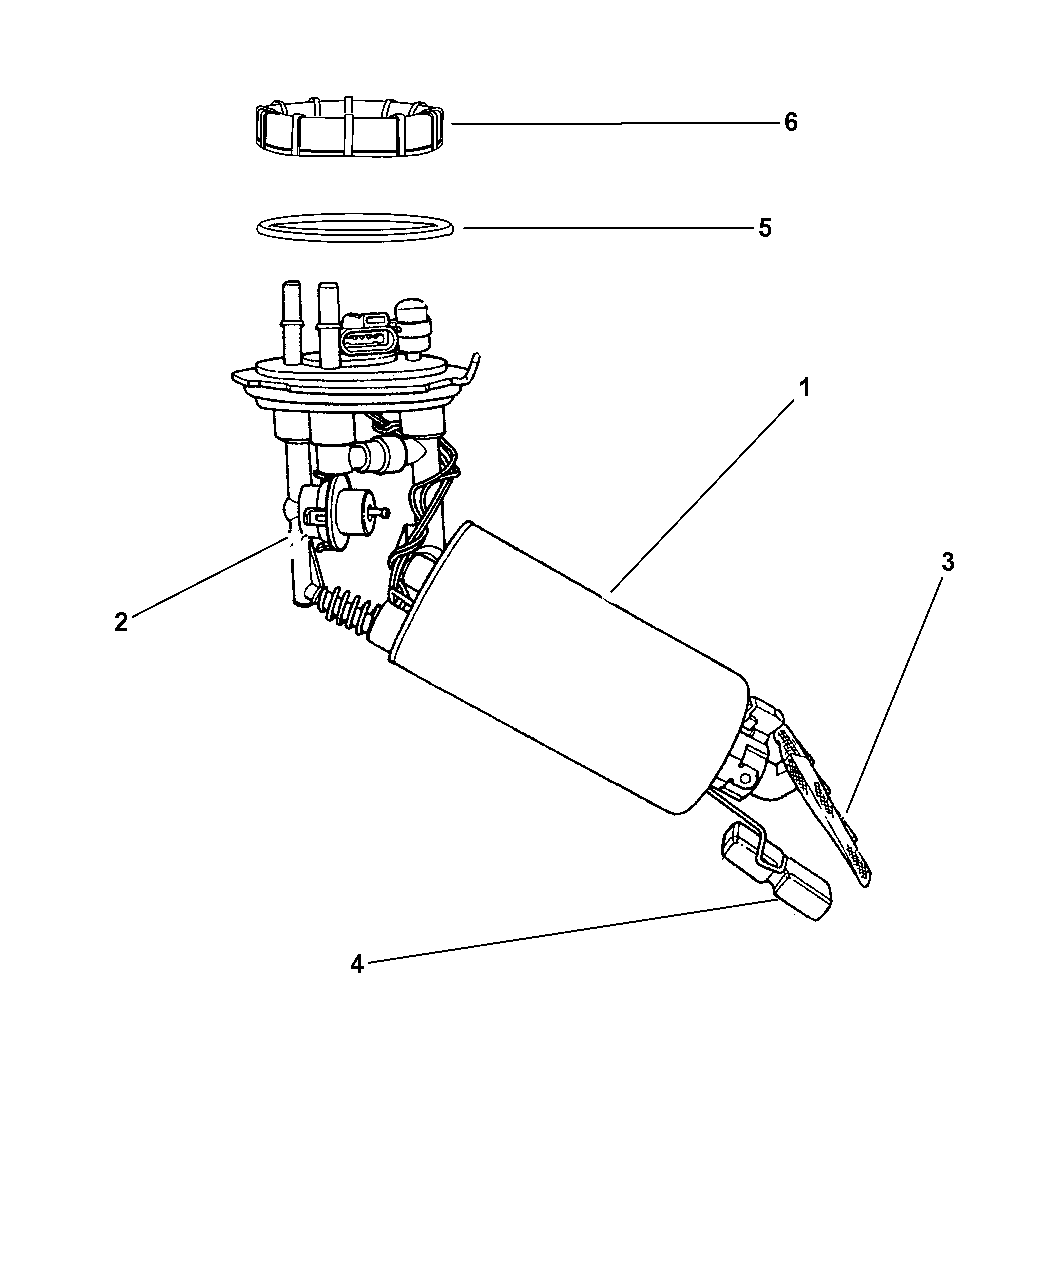 Ford 4 0 Sohc Engine Diagram Showing Oil Pump - Wiring Diagram